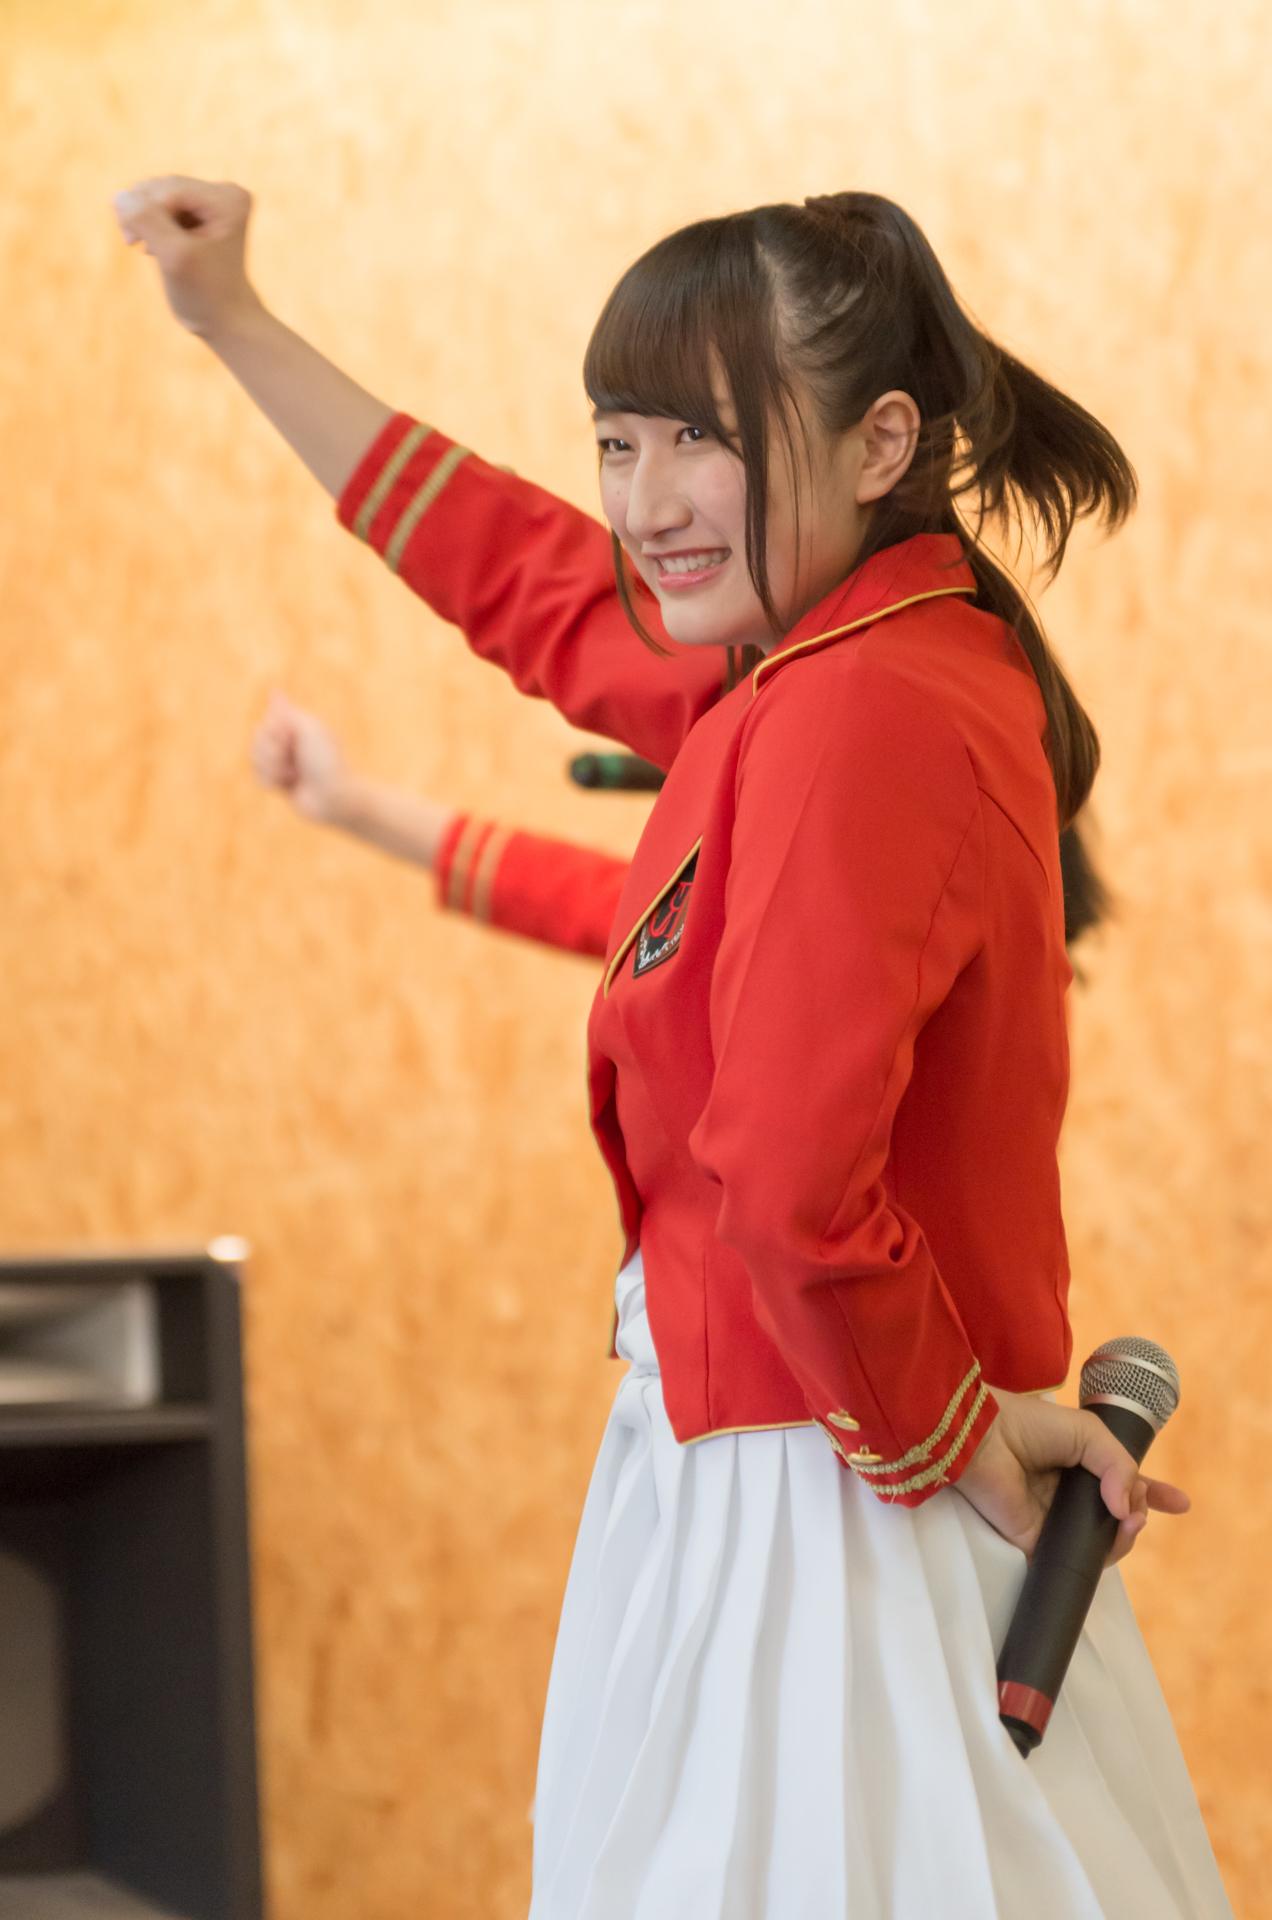 Teamくれれっ娘! 信野樹奈 | 苗の木Live&Party Vol.1